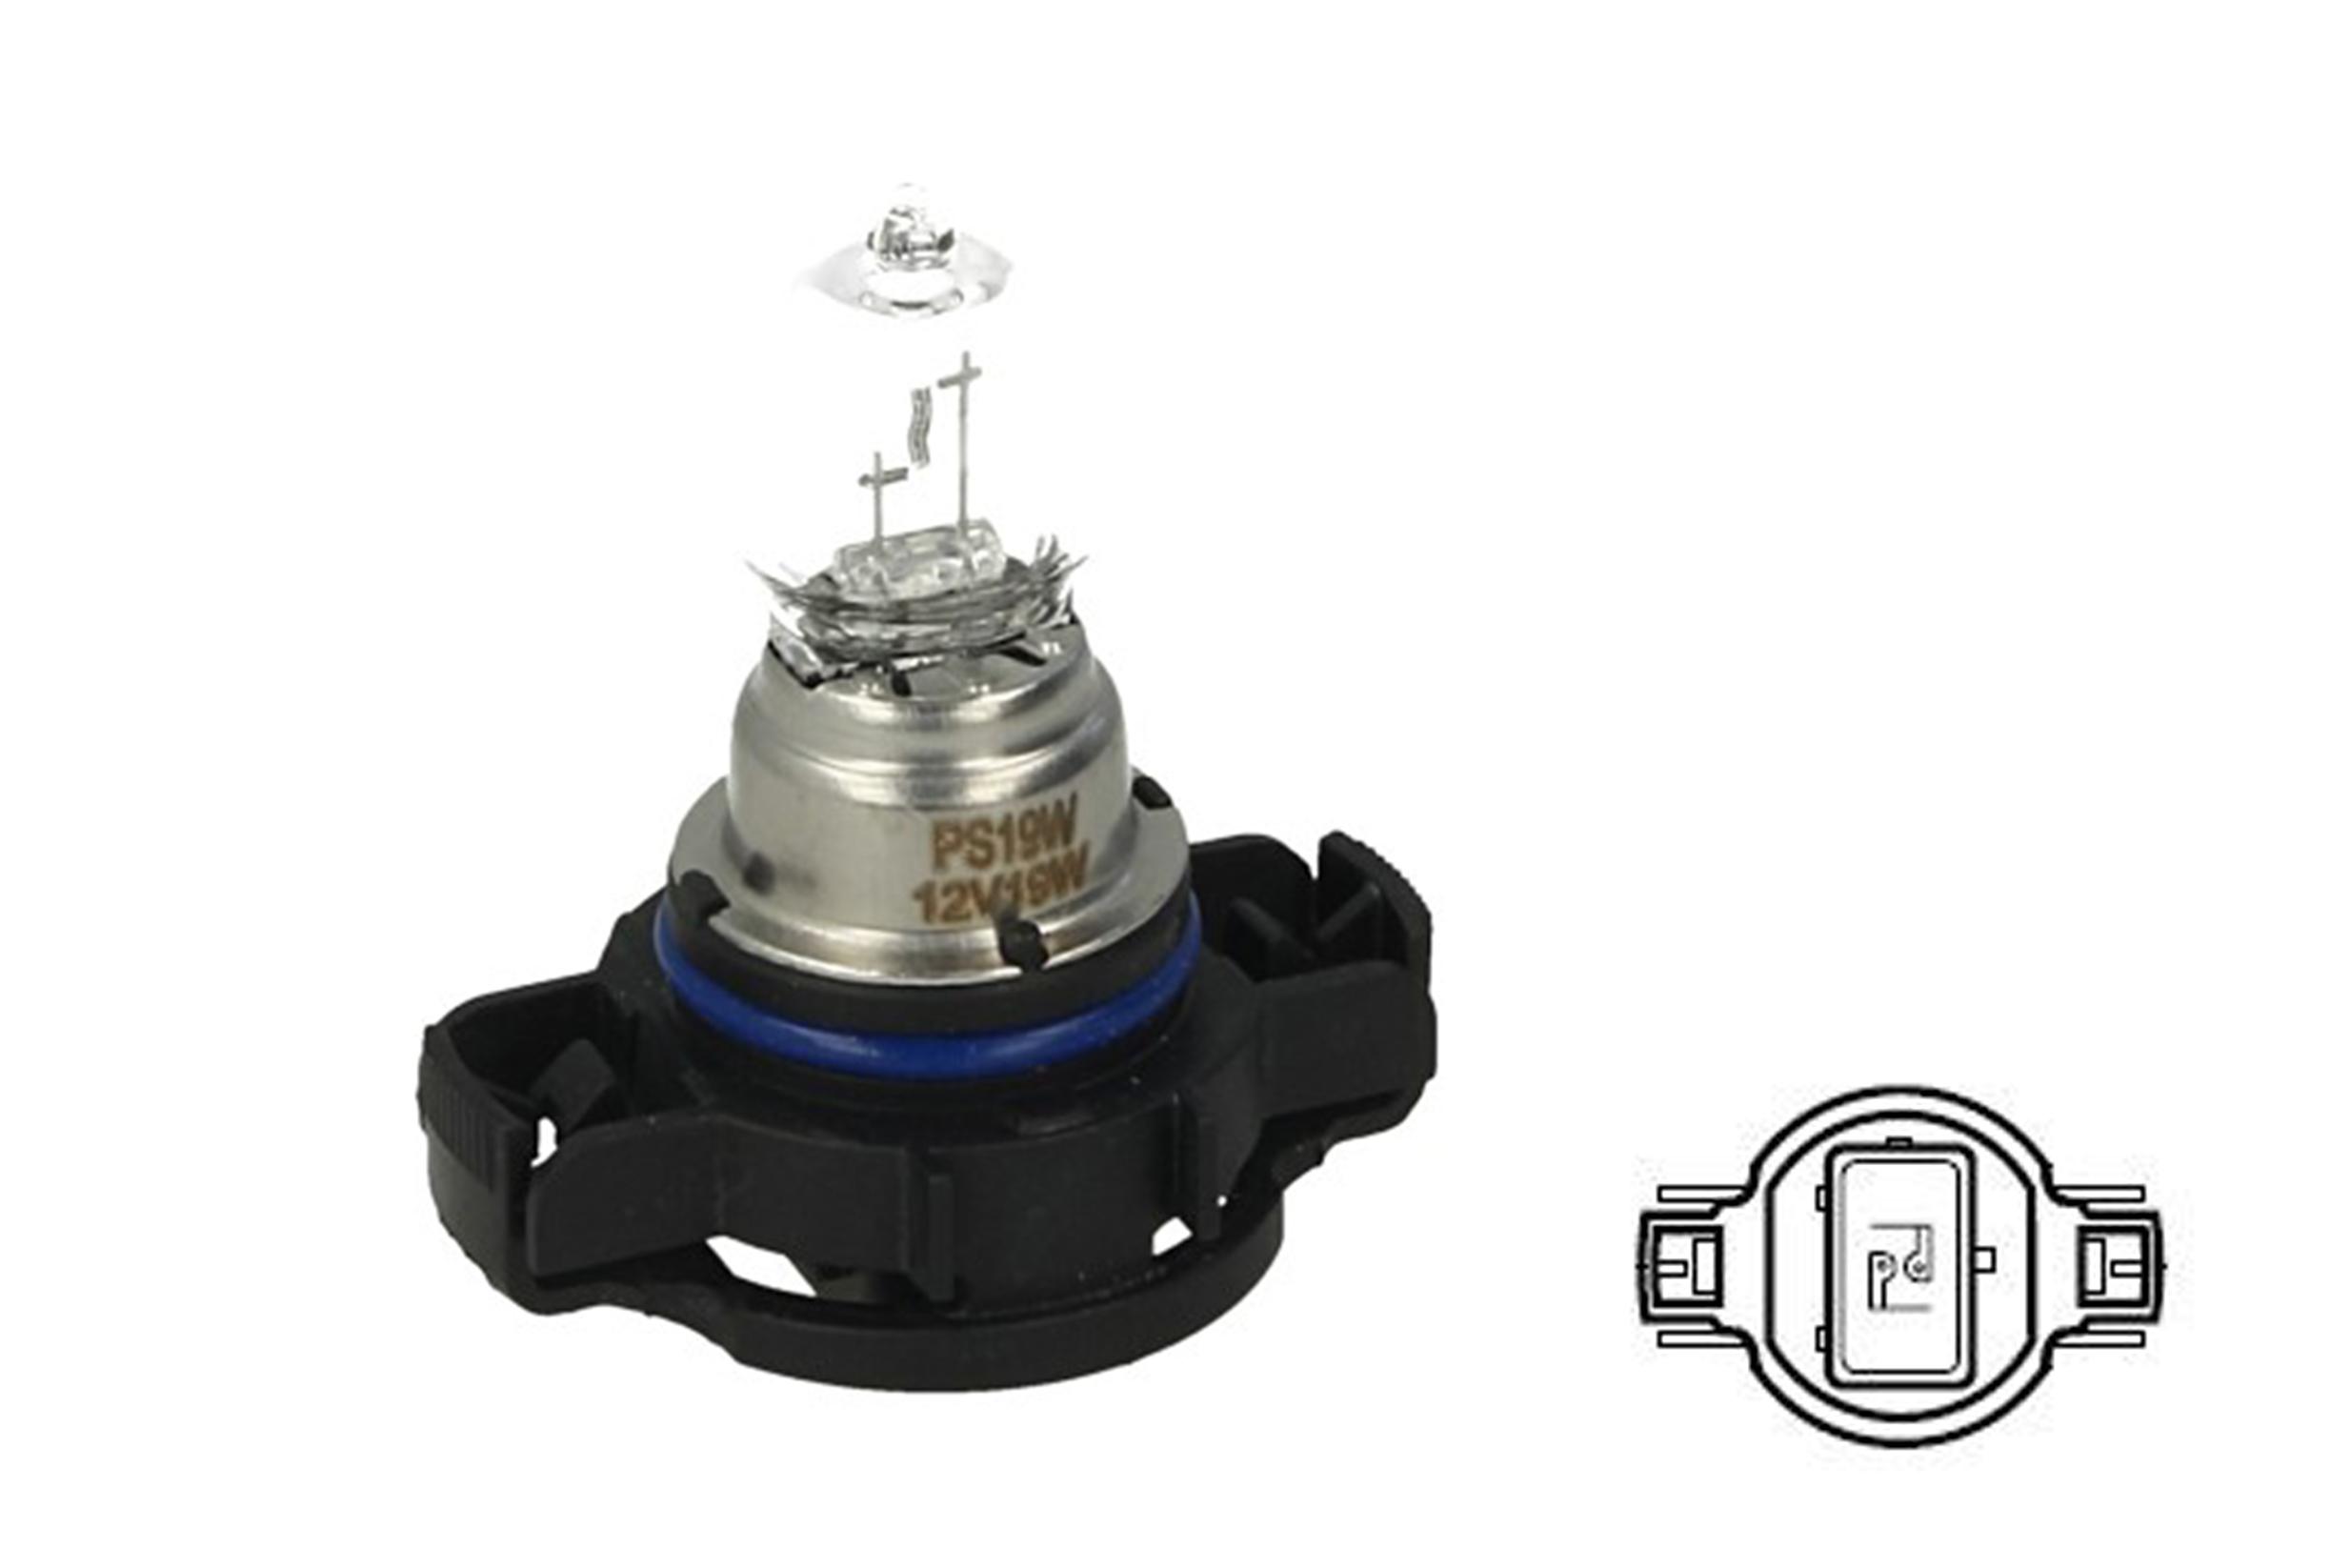 Lampada Alogena PS19W 12V 19W PG20-1 Clear Compatibile Philips 12085LL C1 - PZ